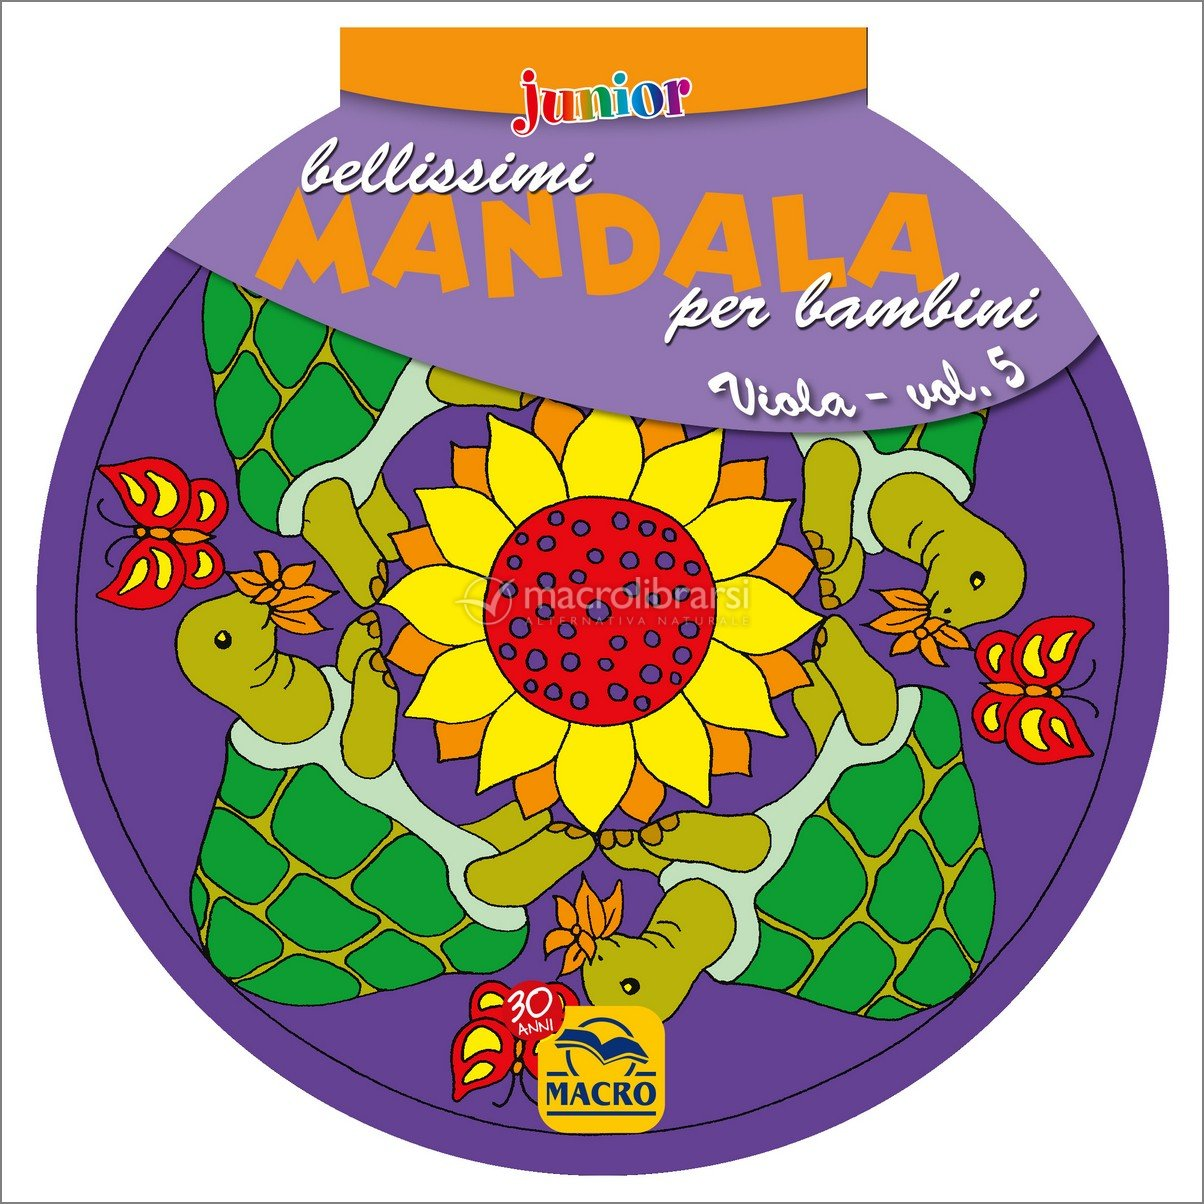 Bellissimi mandala per bambini - vol. 5 viola - libro